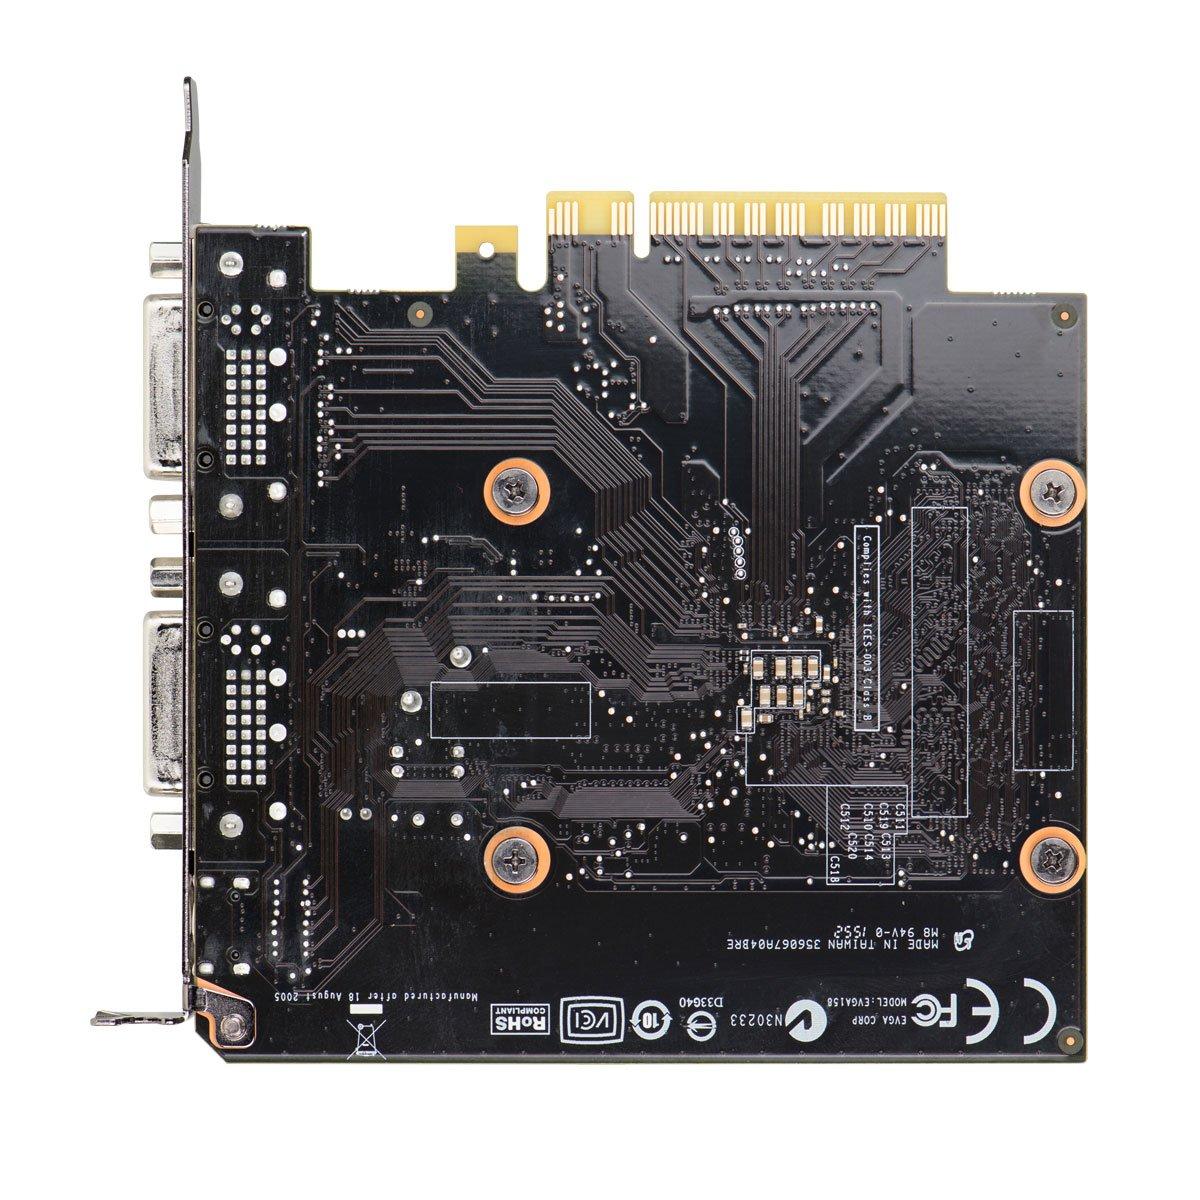 EVGA GT 710 2GB DDR3 64bit Single Slot, Dual DVI 02G-P3-2717-KR by EVGA (Image #7)